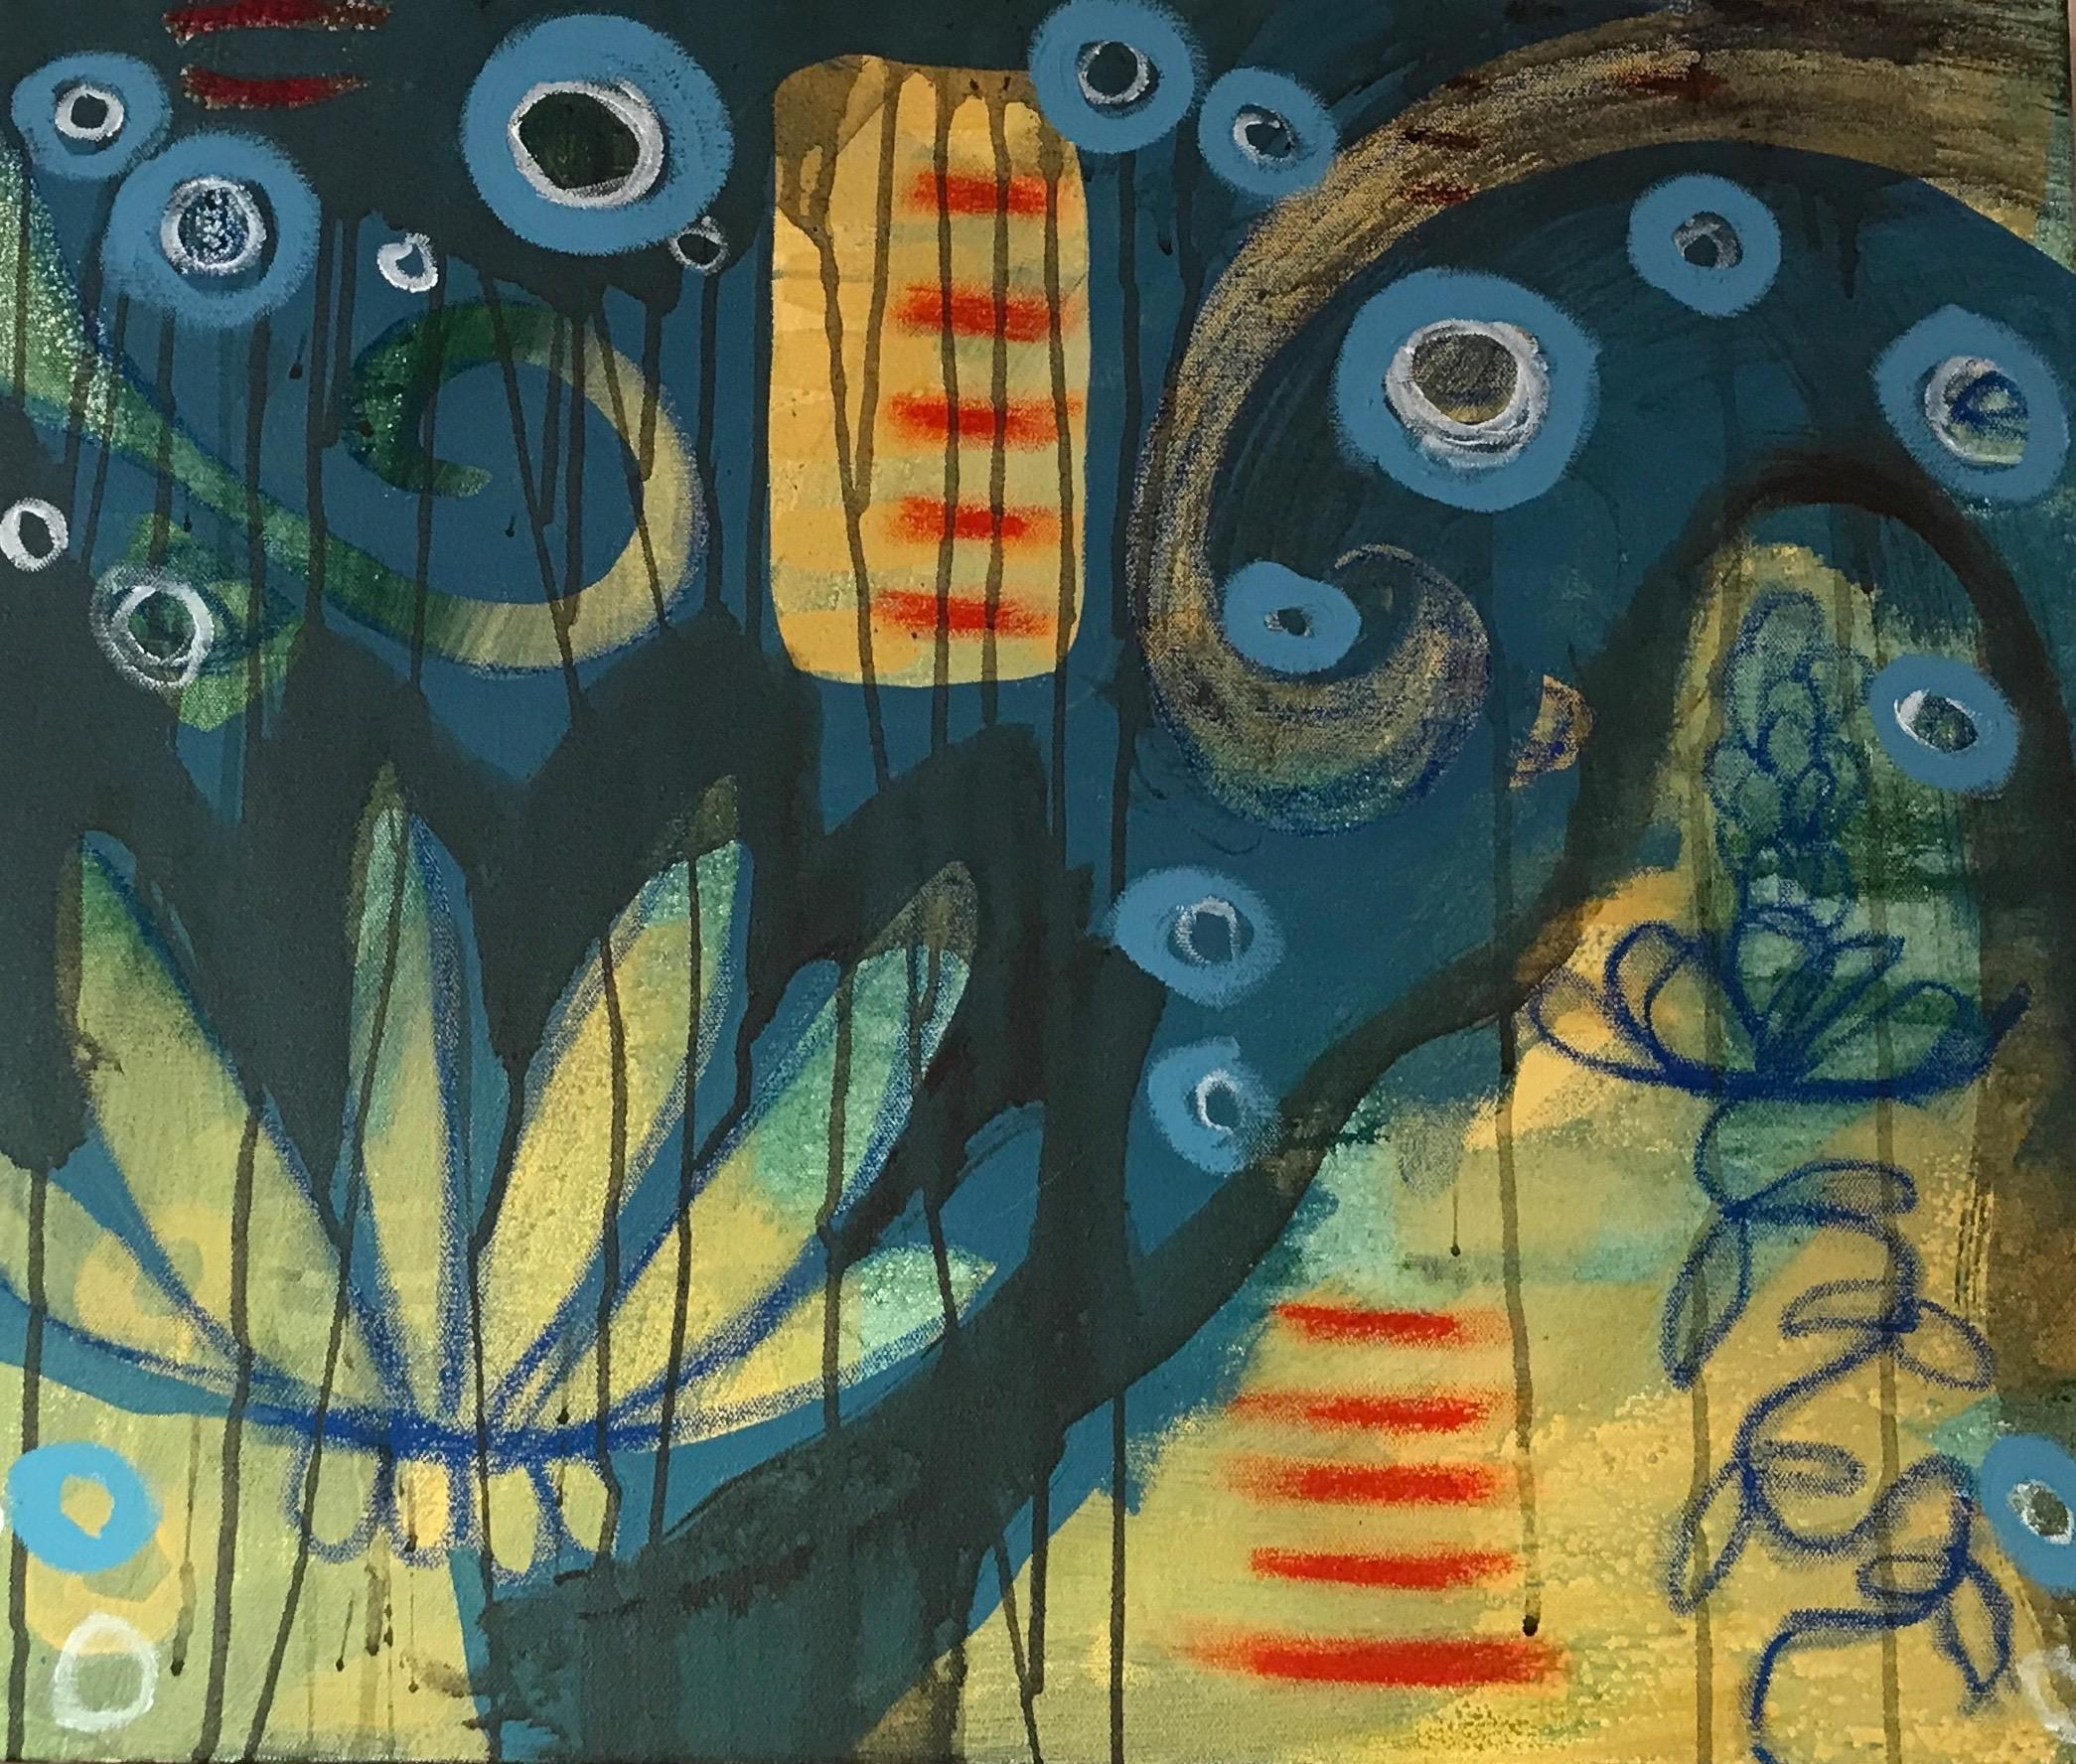 Prayer Path by Melanie Yazzie painting blue, green, red  yellow botanical Navajo